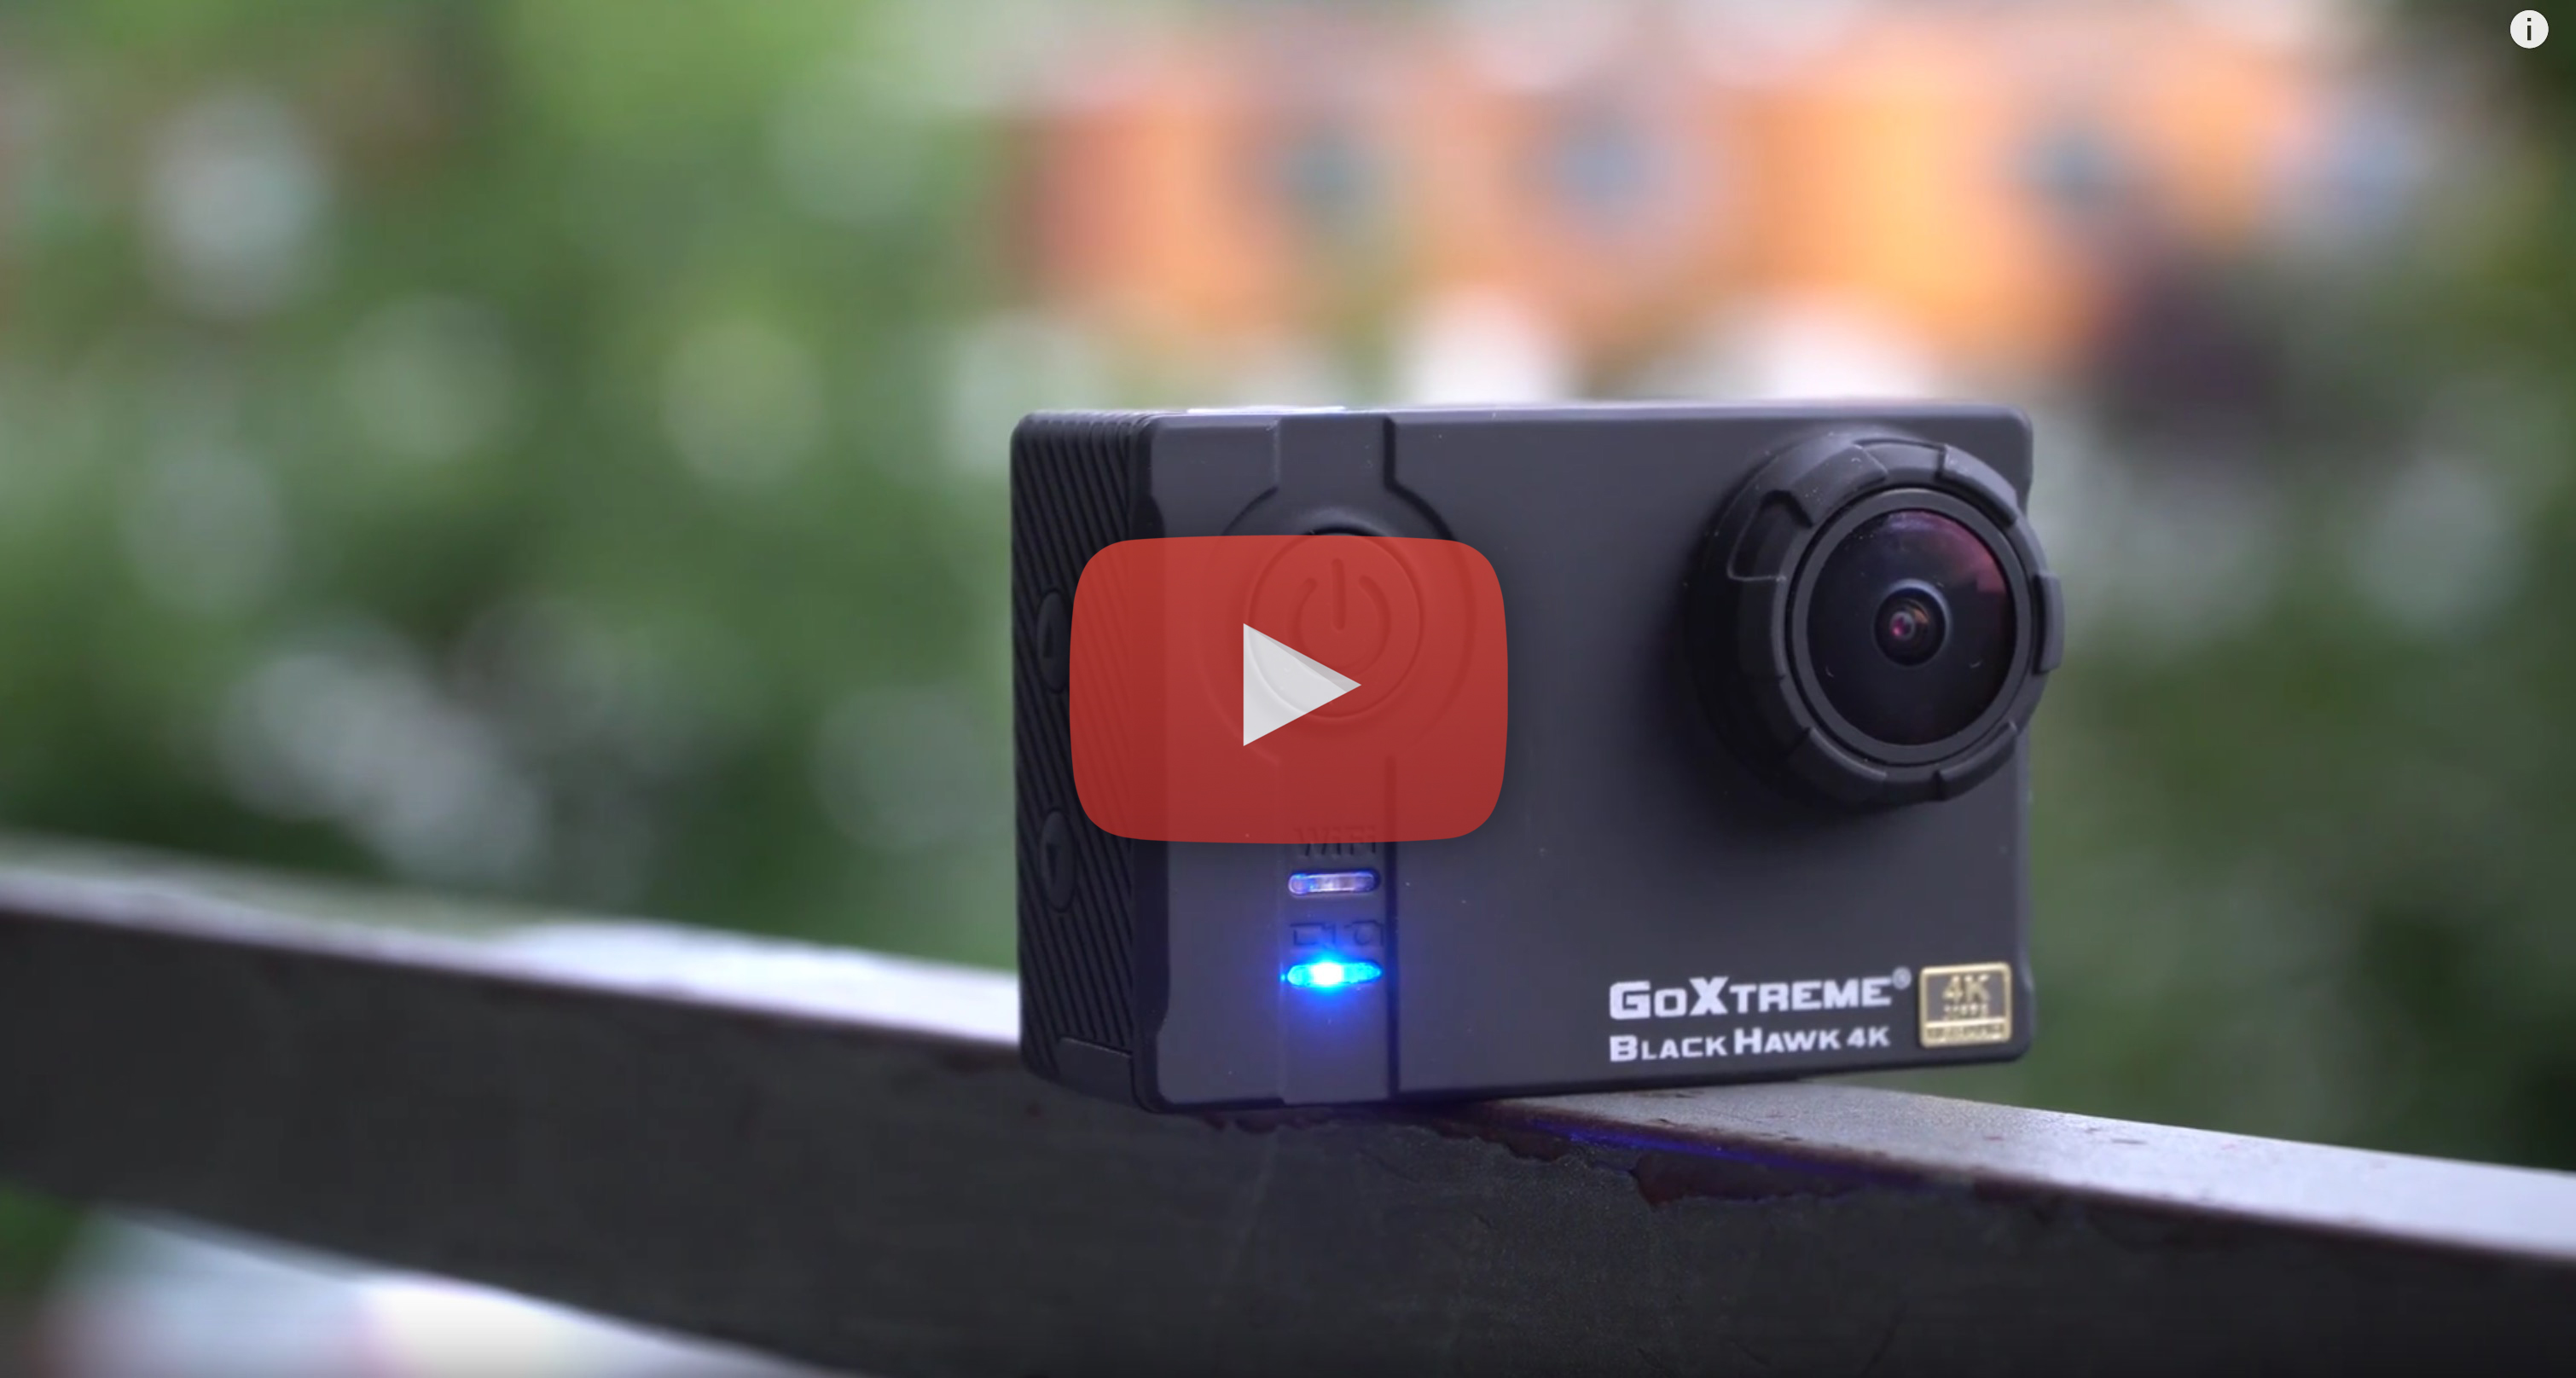 Easypix BlackHawk 4k Review - Better than GoPro actioncams?